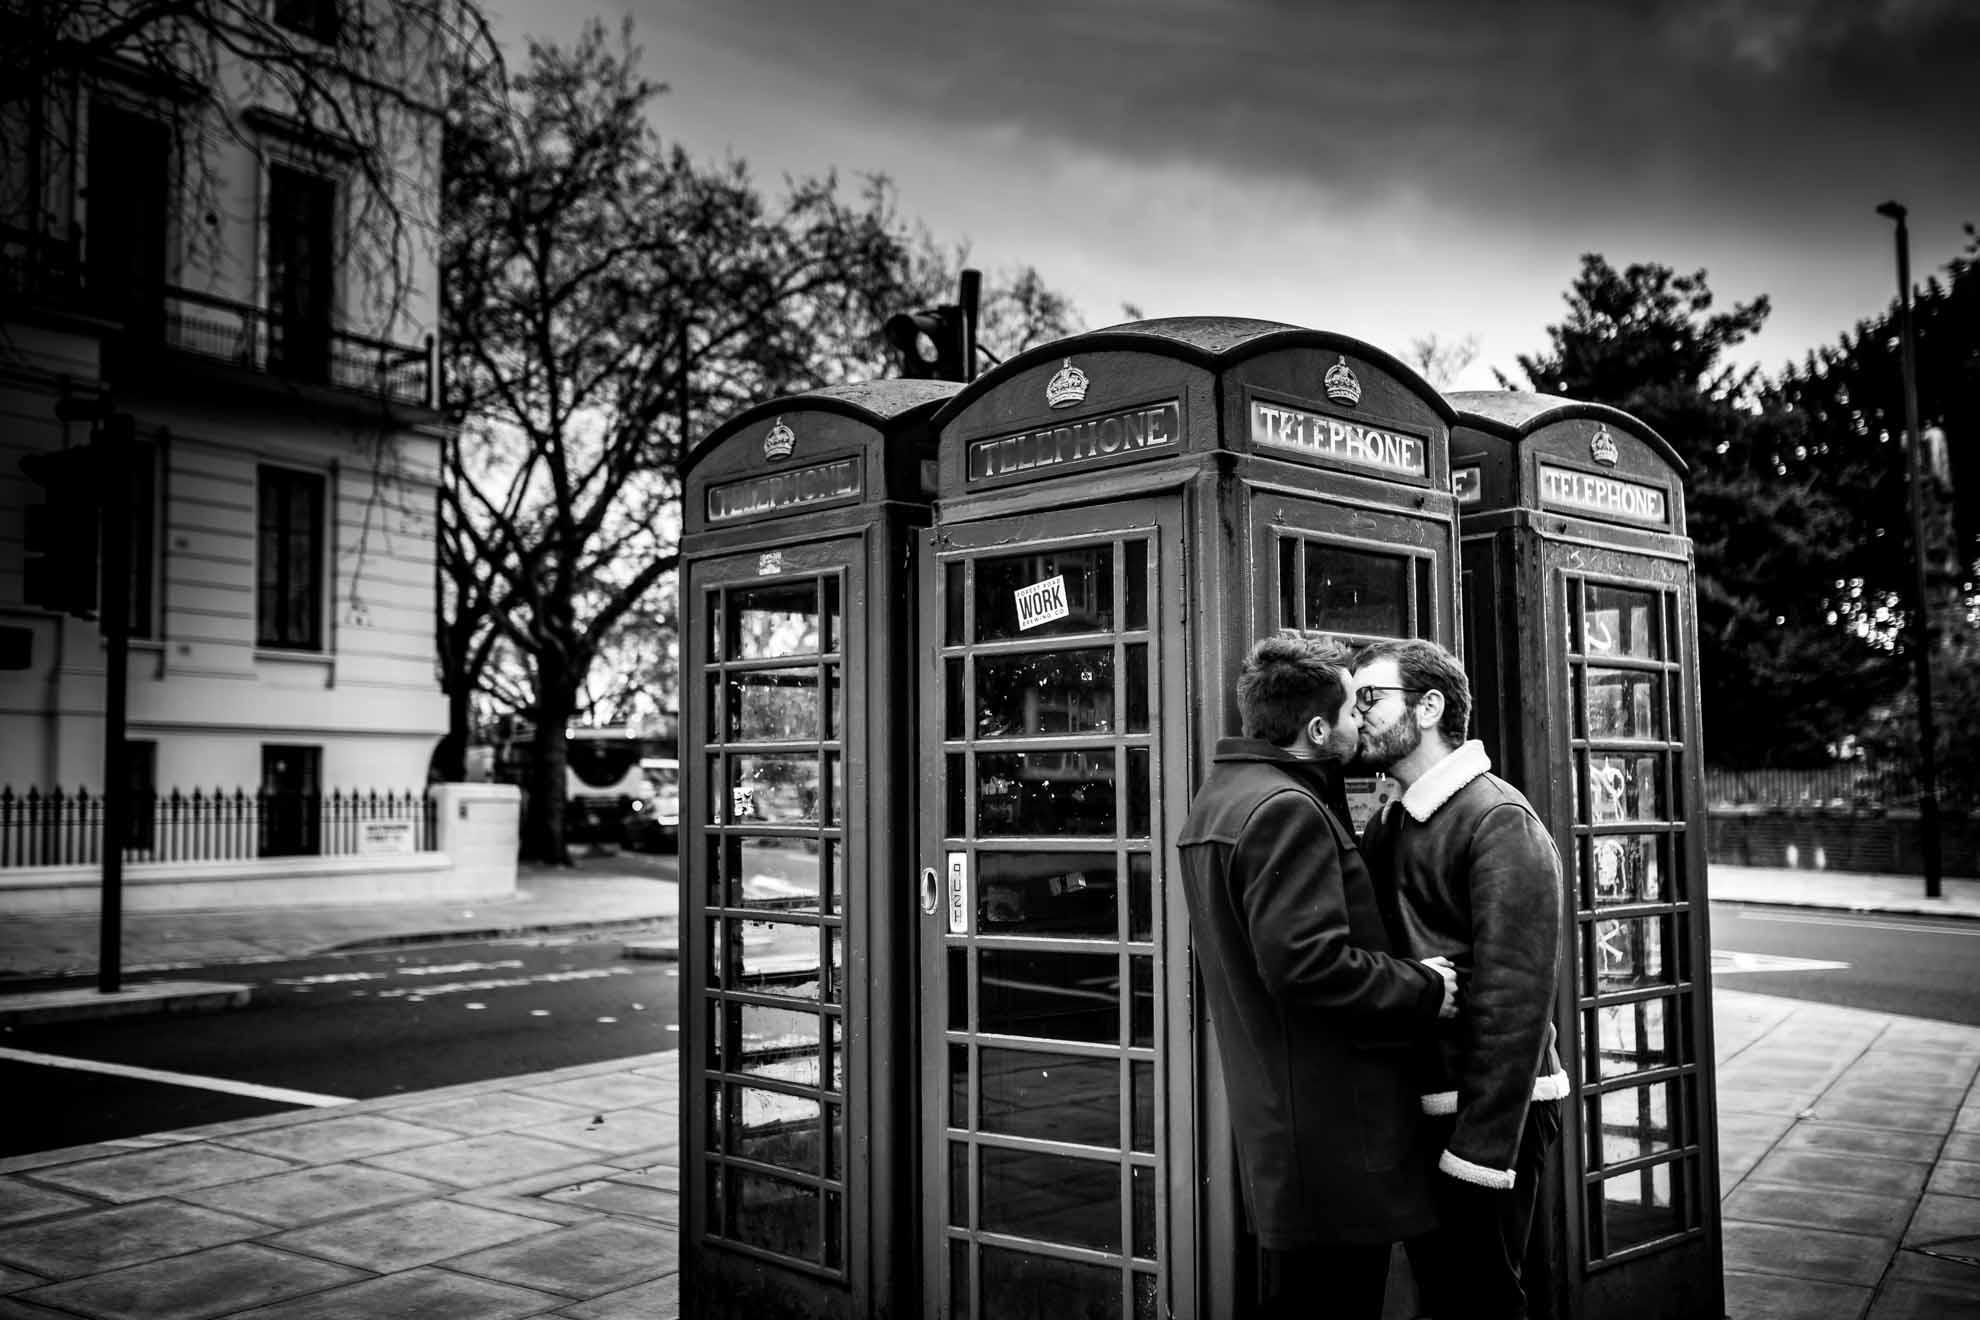 preboda-londres-sesion-fotografia-london-reportaje-pareja-fotografos-boda-gipuzkoa (40)